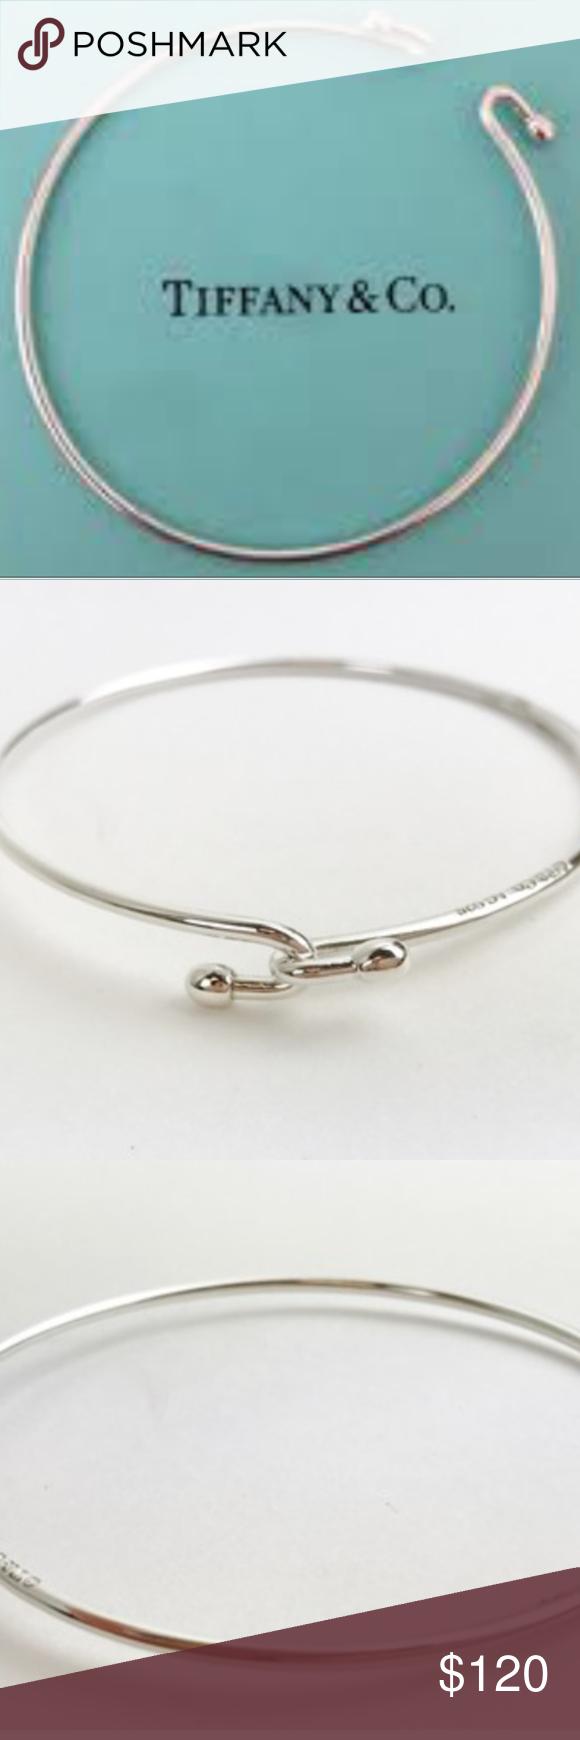 3689ec10f Sterling Silver Wire Bracelet Simple, elegant Tiffany & Co. Sterling Silver  Wire Bracelet . Measures approximately 2.25